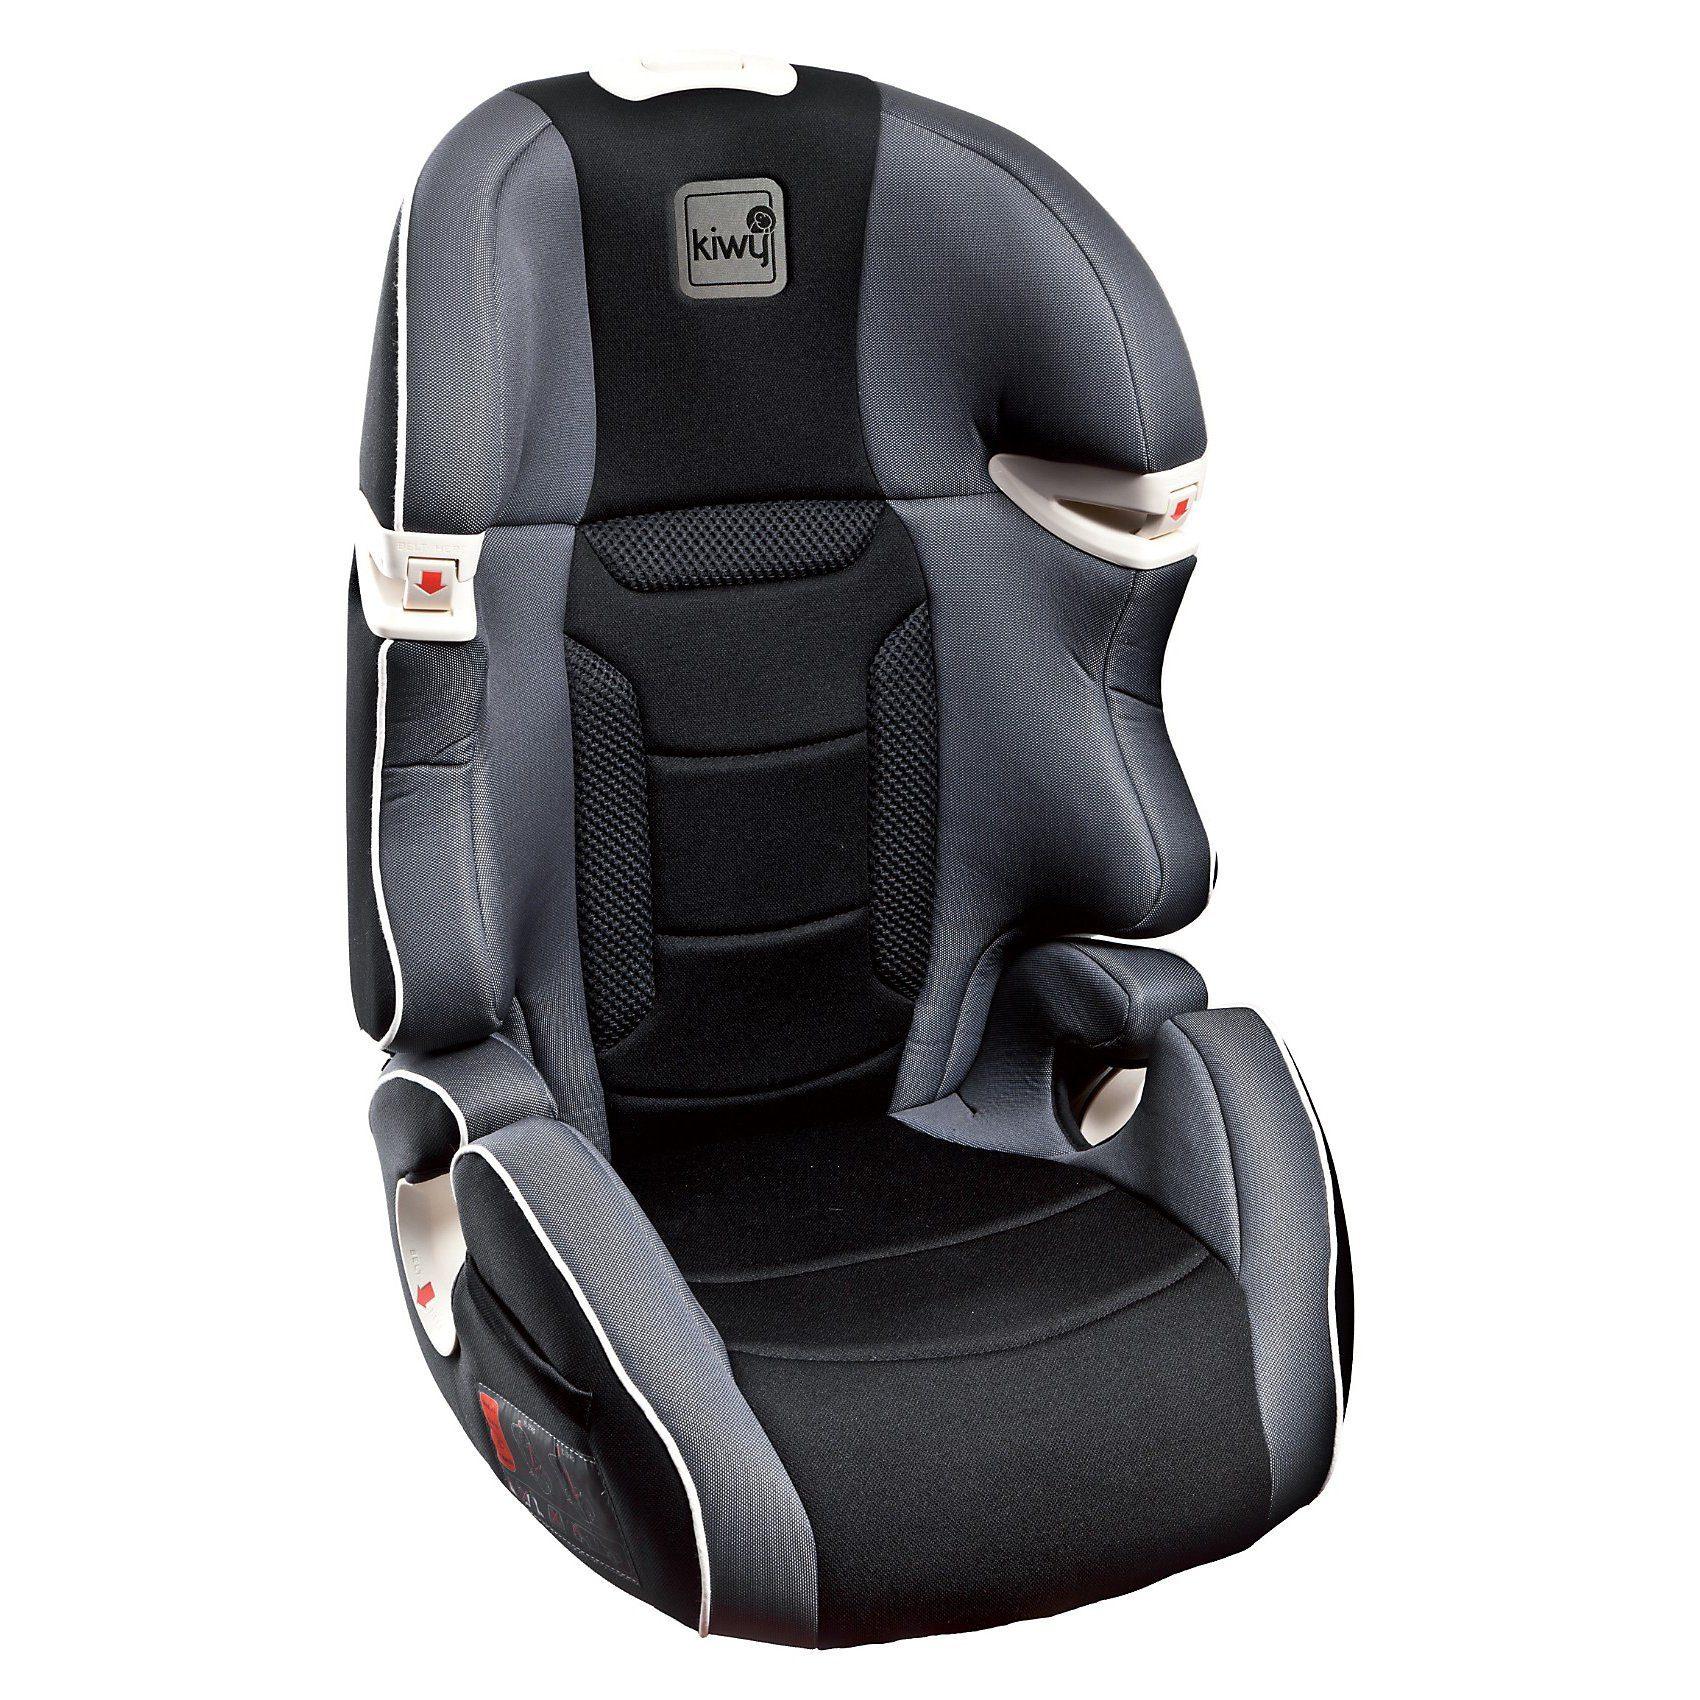 Kiwy Auto-Kindersitz SLF23 Q-Fix, Carbon, 2017